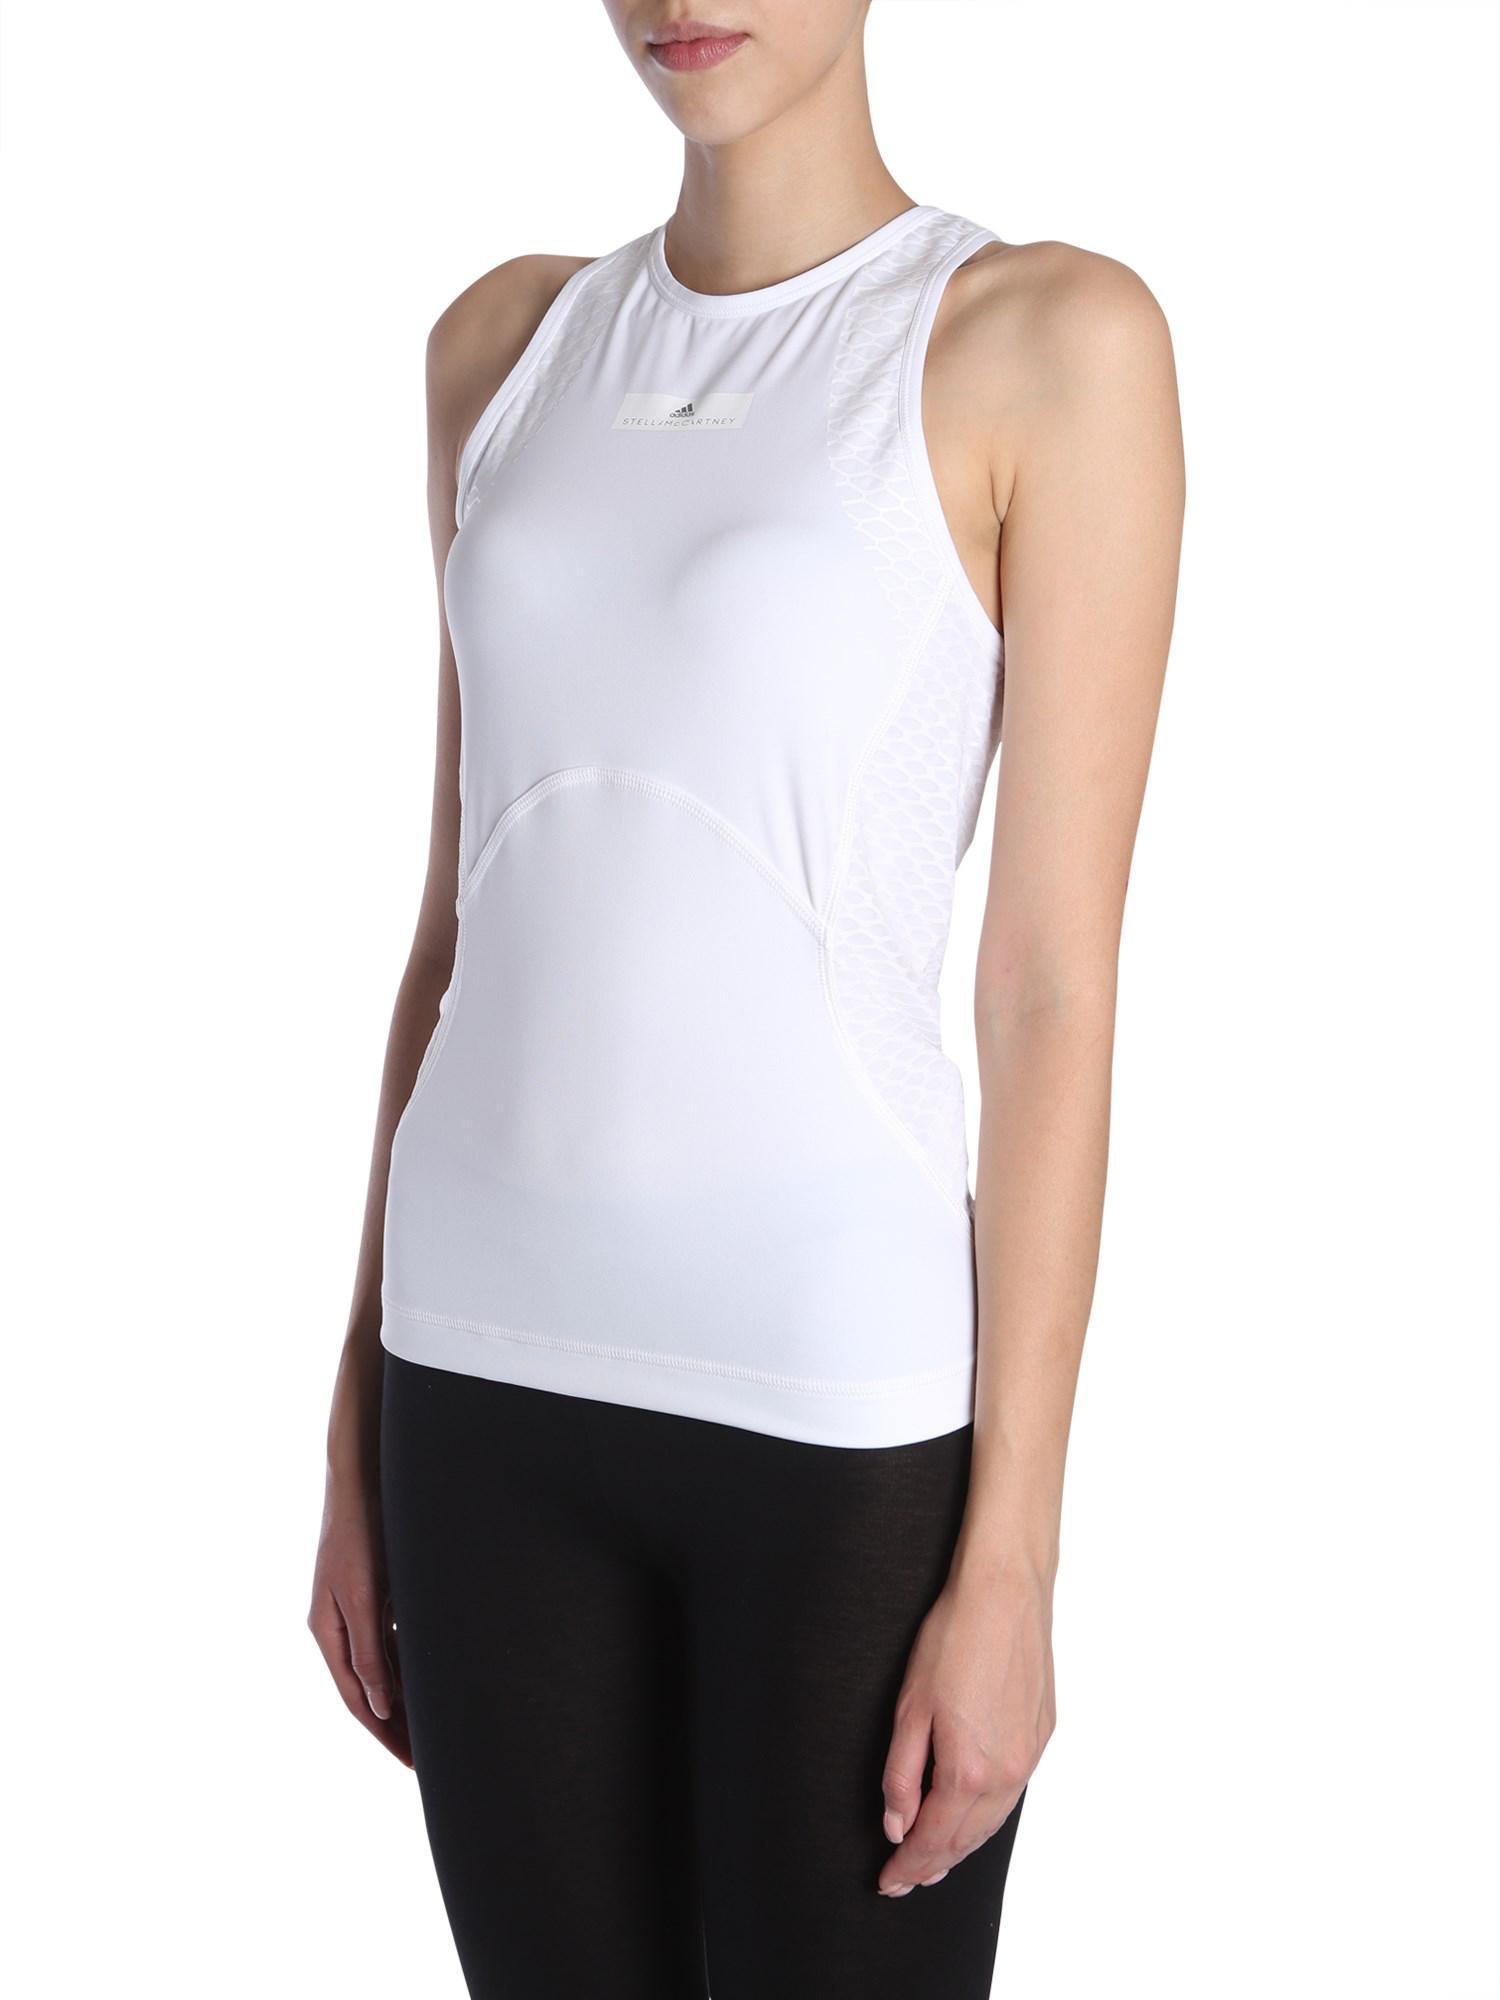 1c62fa476d Adidas By Stella McCartney - White Tank Top - Lyst. View fullscreen